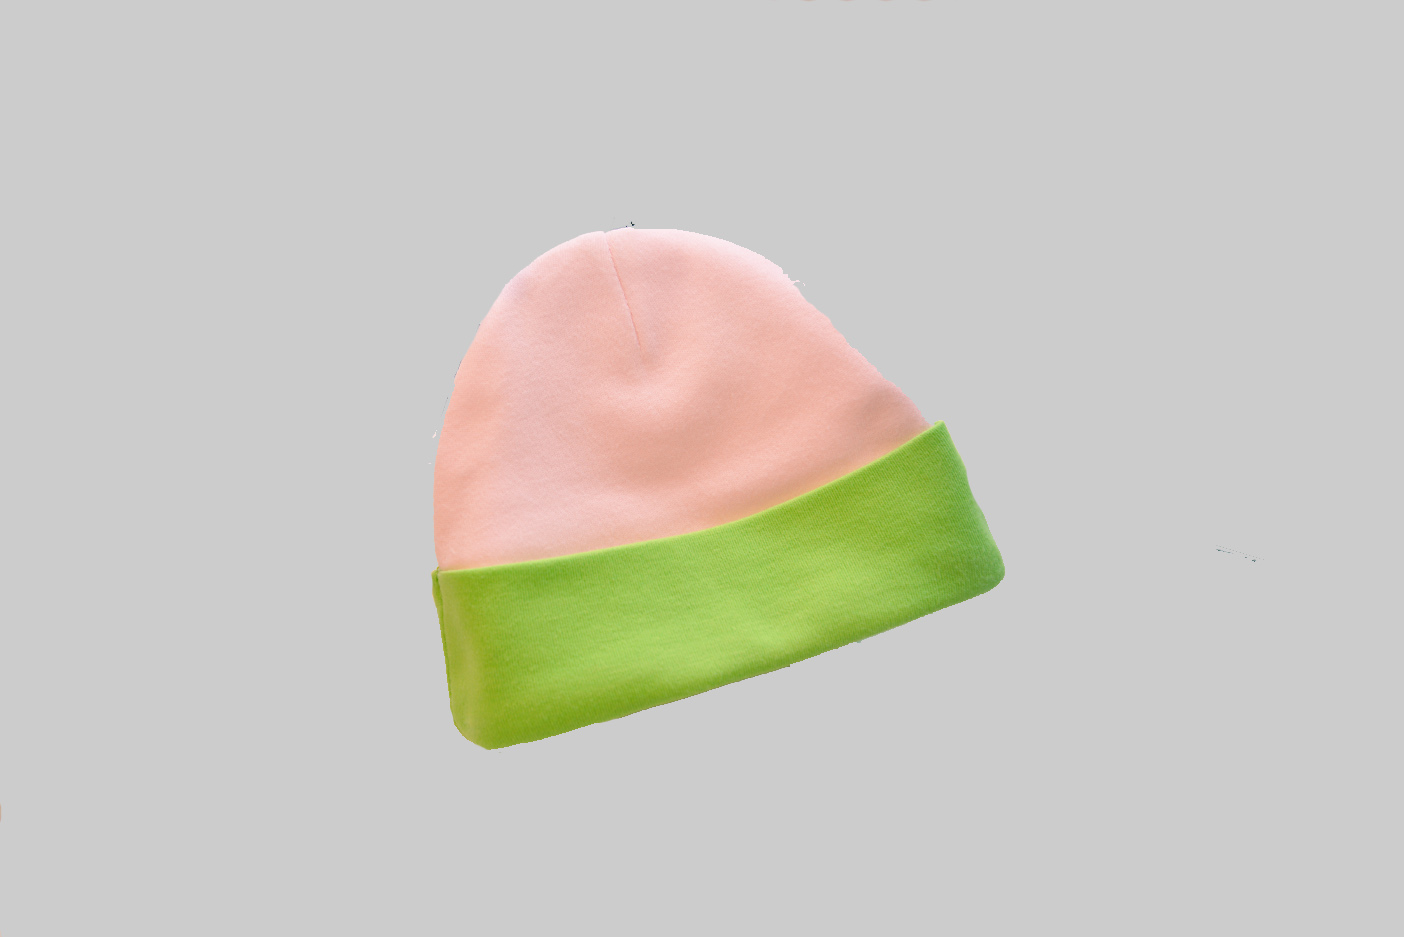 Pink & Green color baby cap